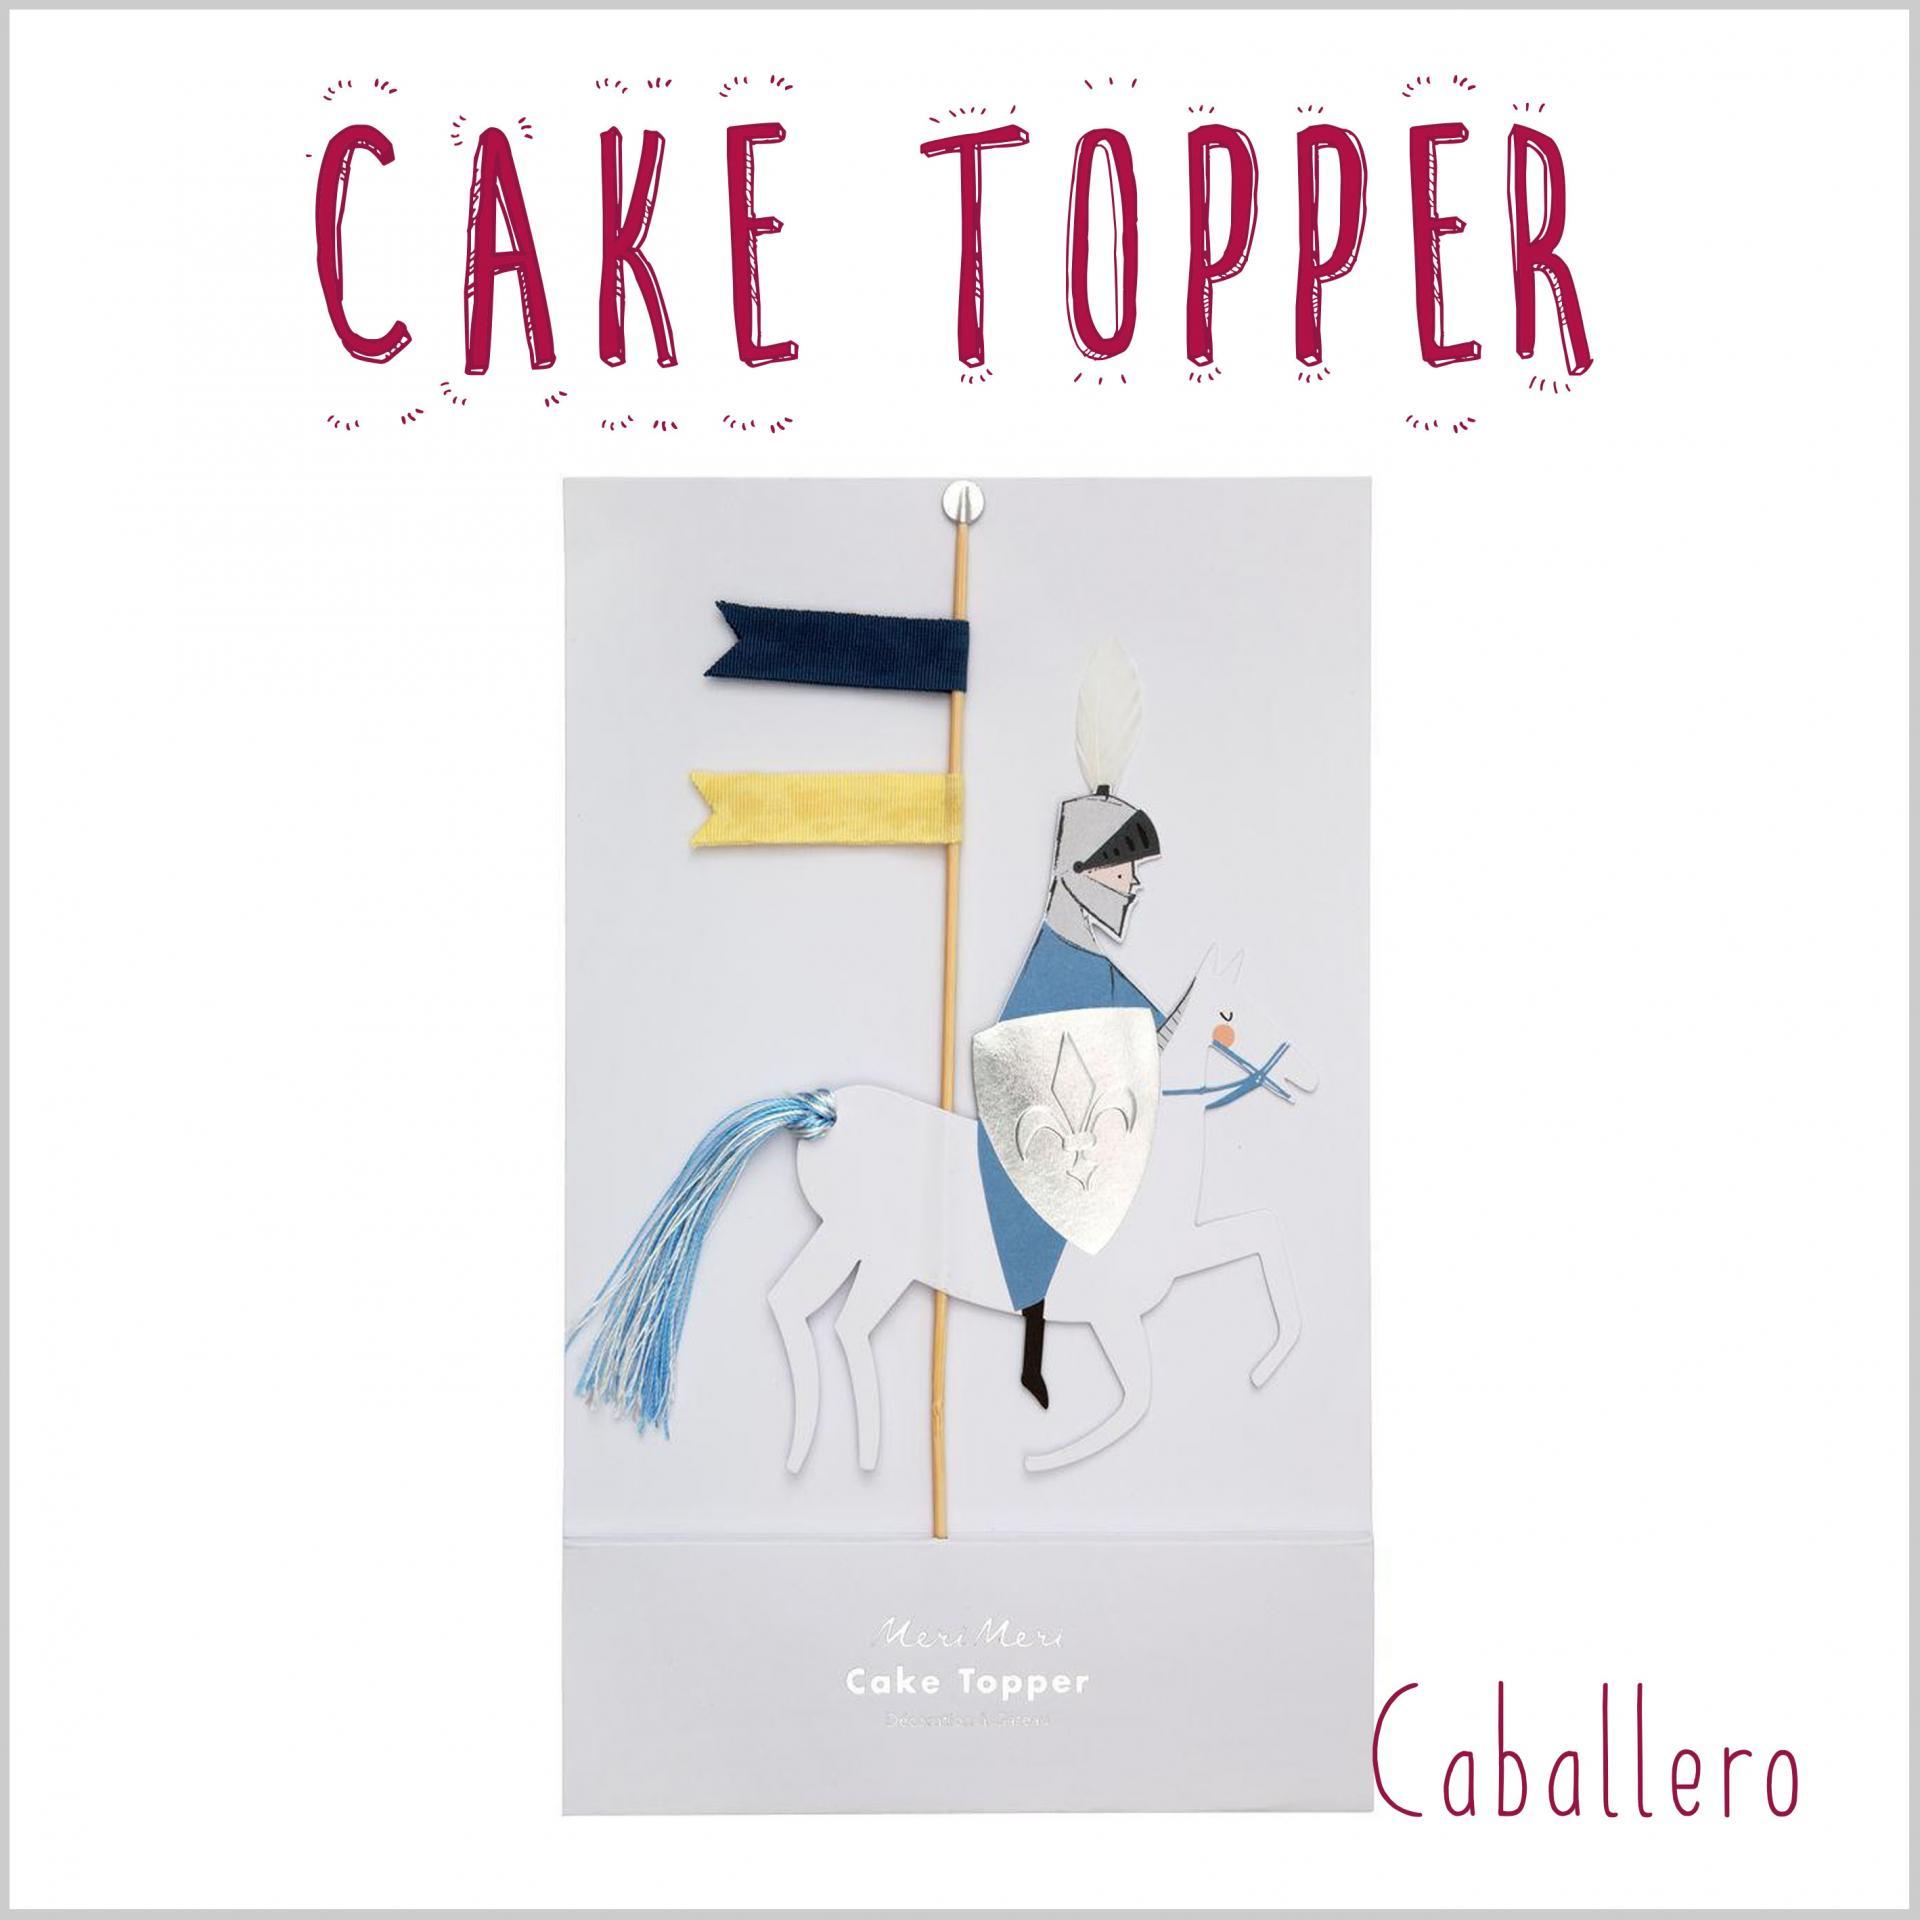 Cake Topper Caballero